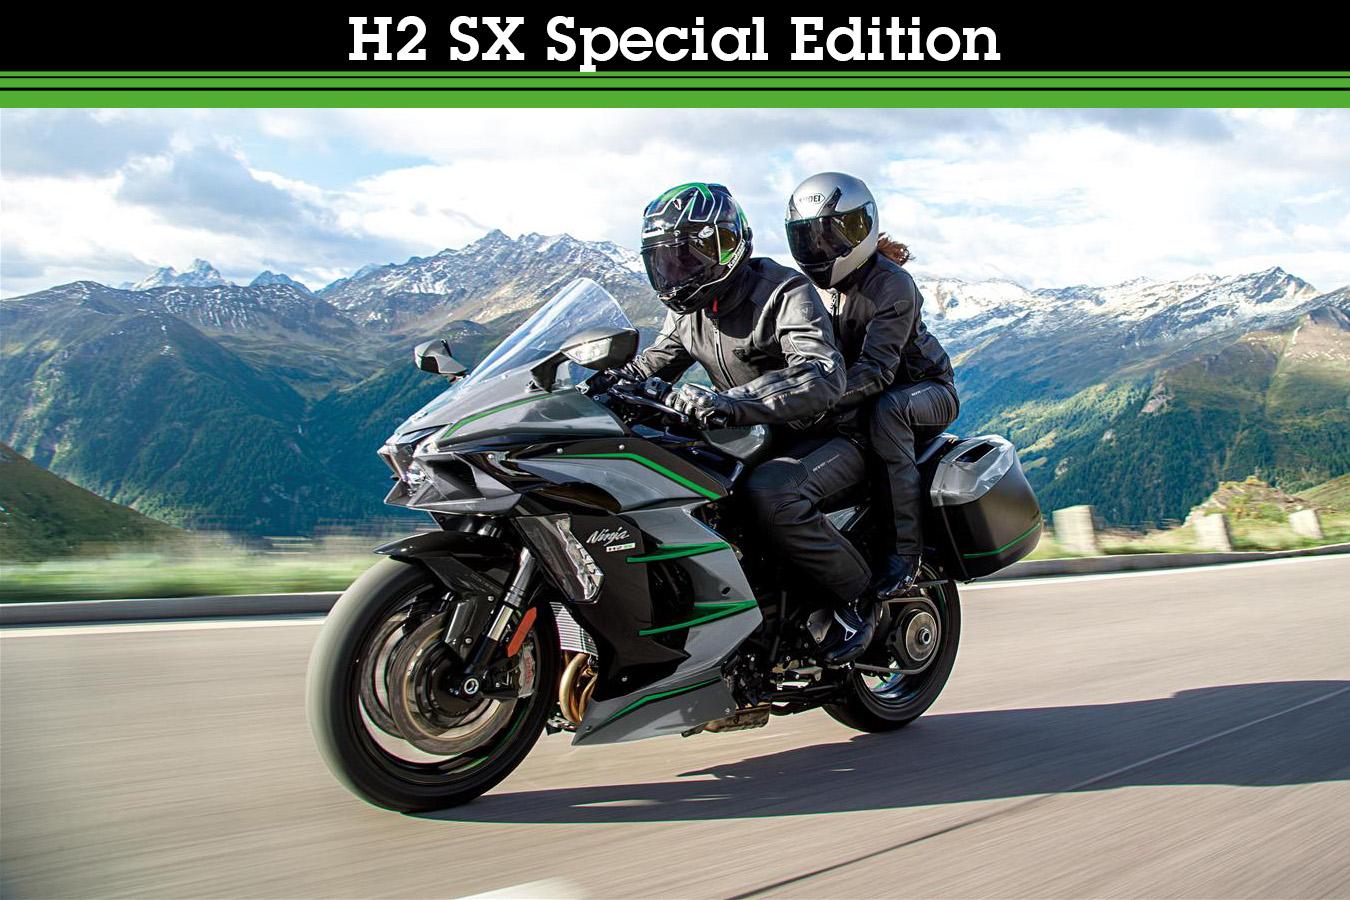 Kawasaki HS2 SX SE Special Edition